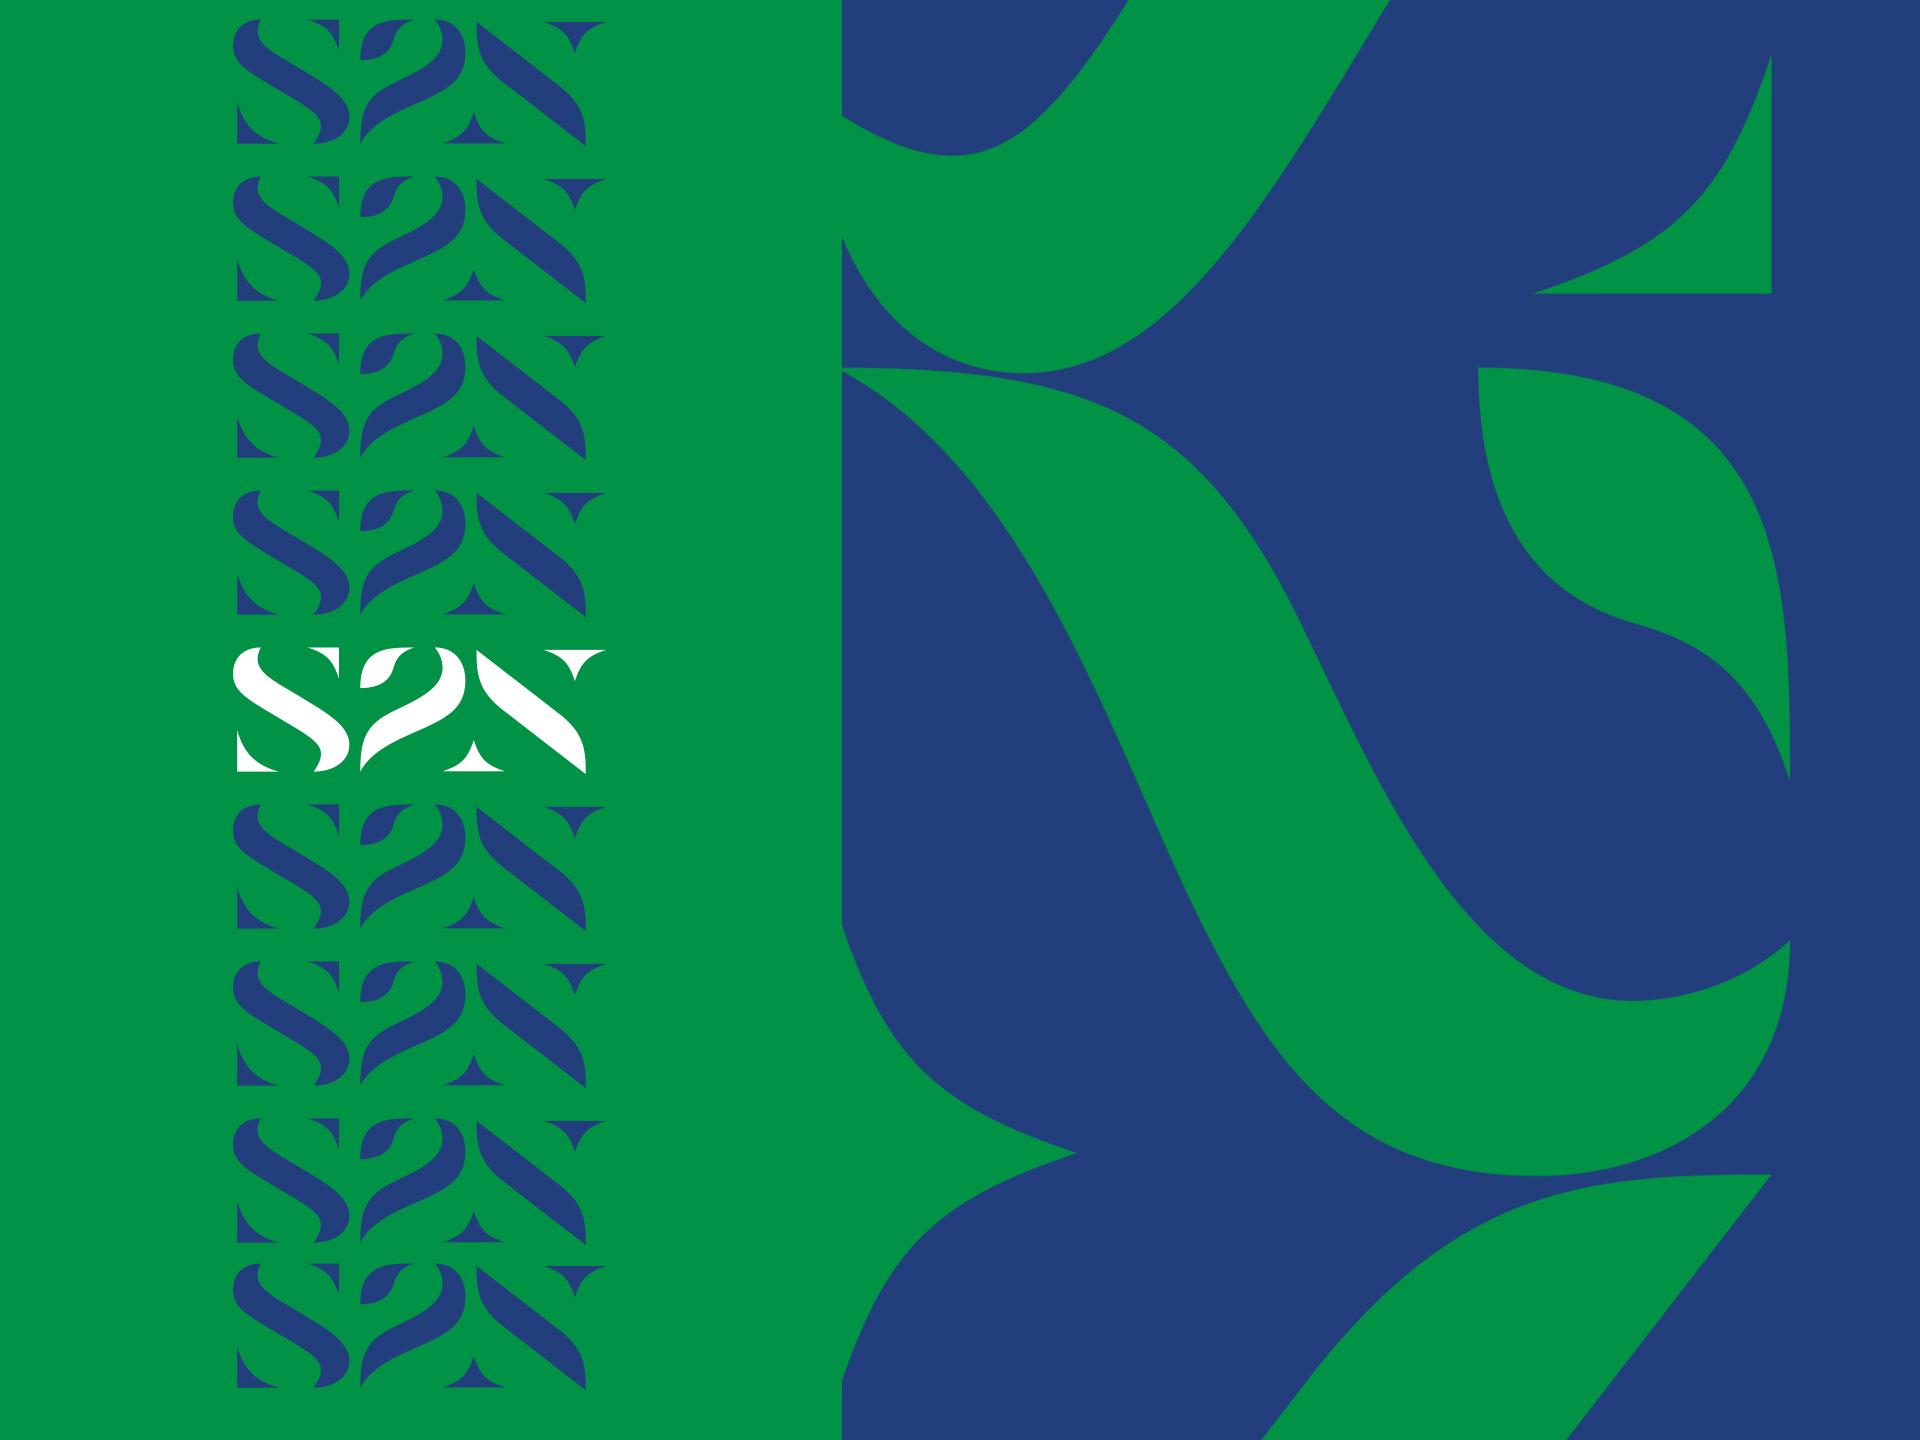 didot_pattern.jpg